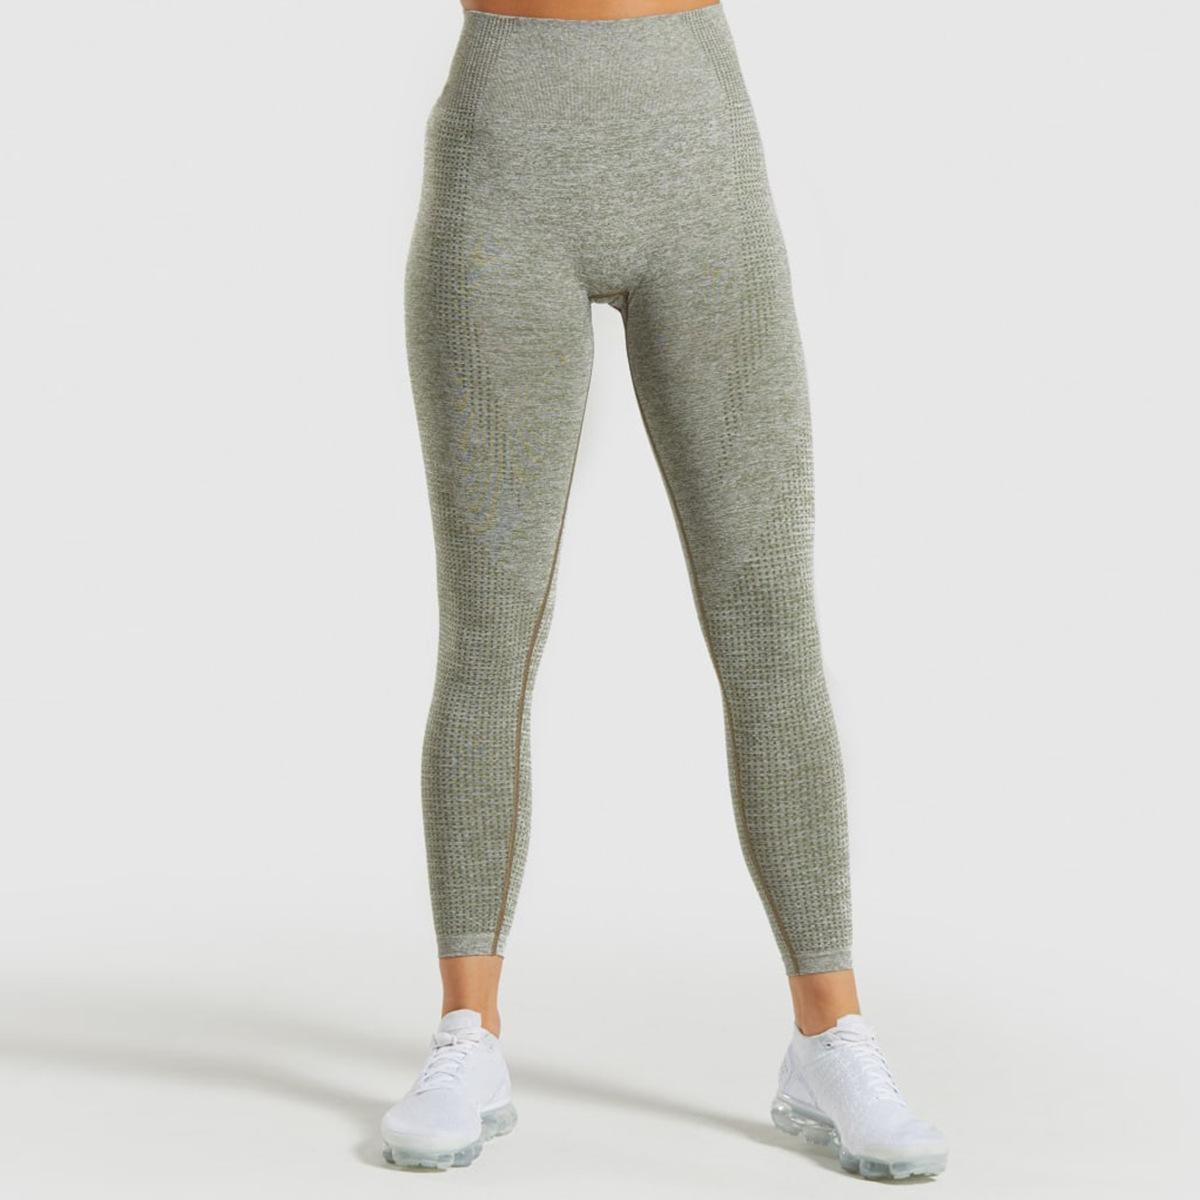 seamless jacquard fitness yoga pants  NSLX8982